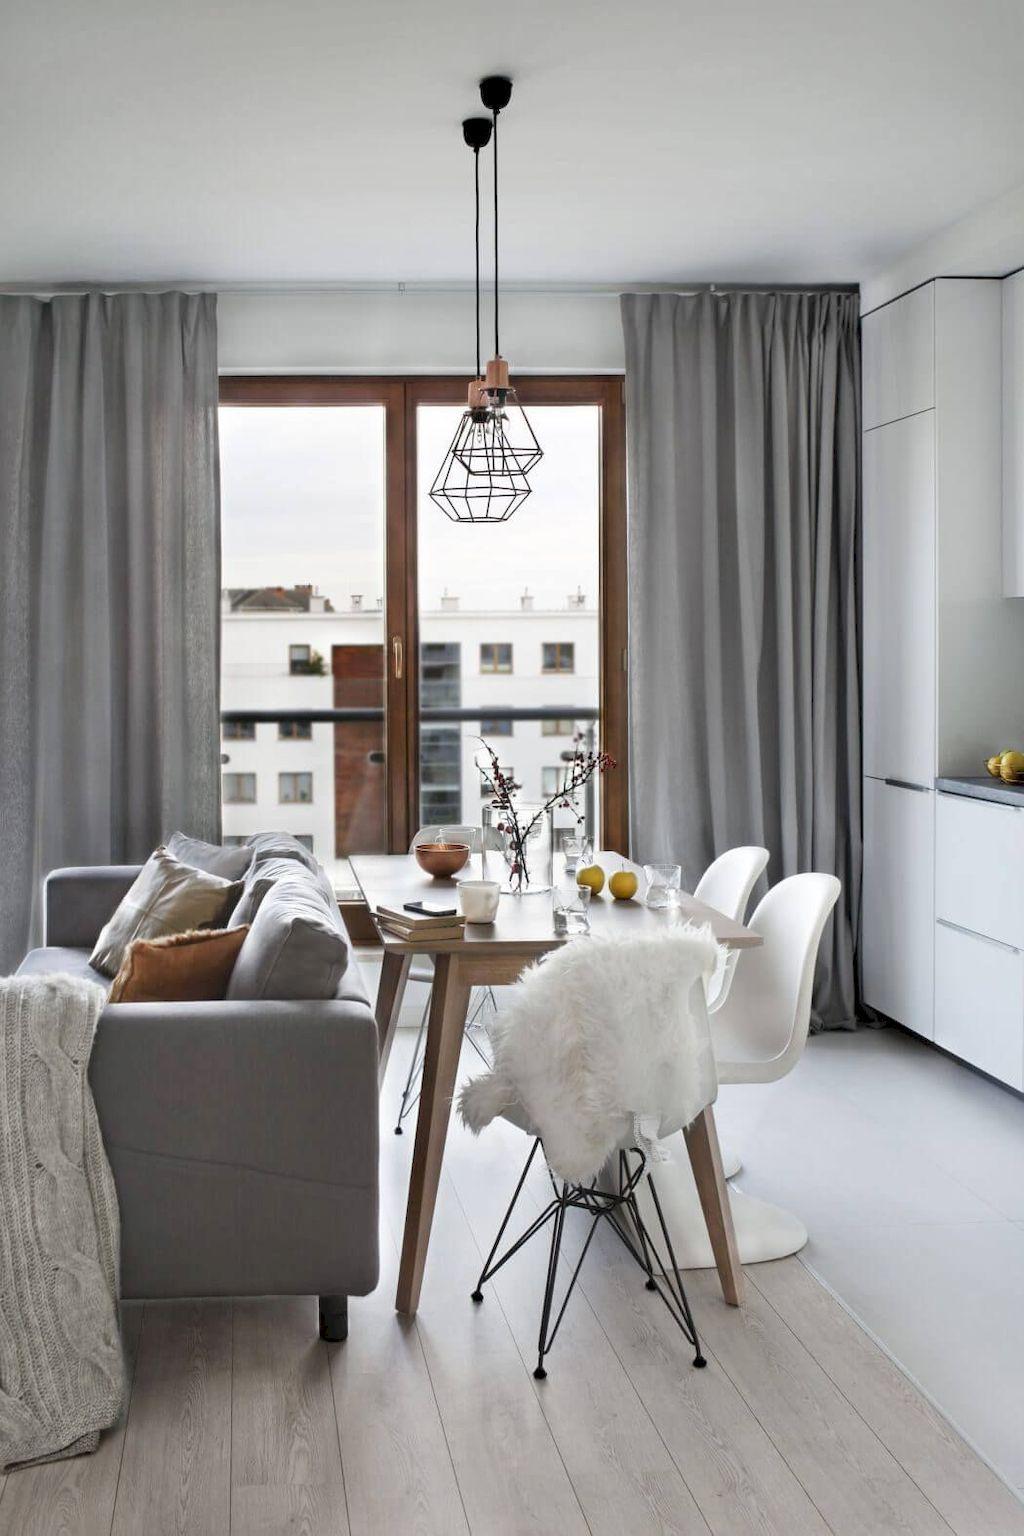 Scandinavian Interior Design Will Always Awesome 5 Small Apartment Interior Scandinavian Dining Room Dining Room Small